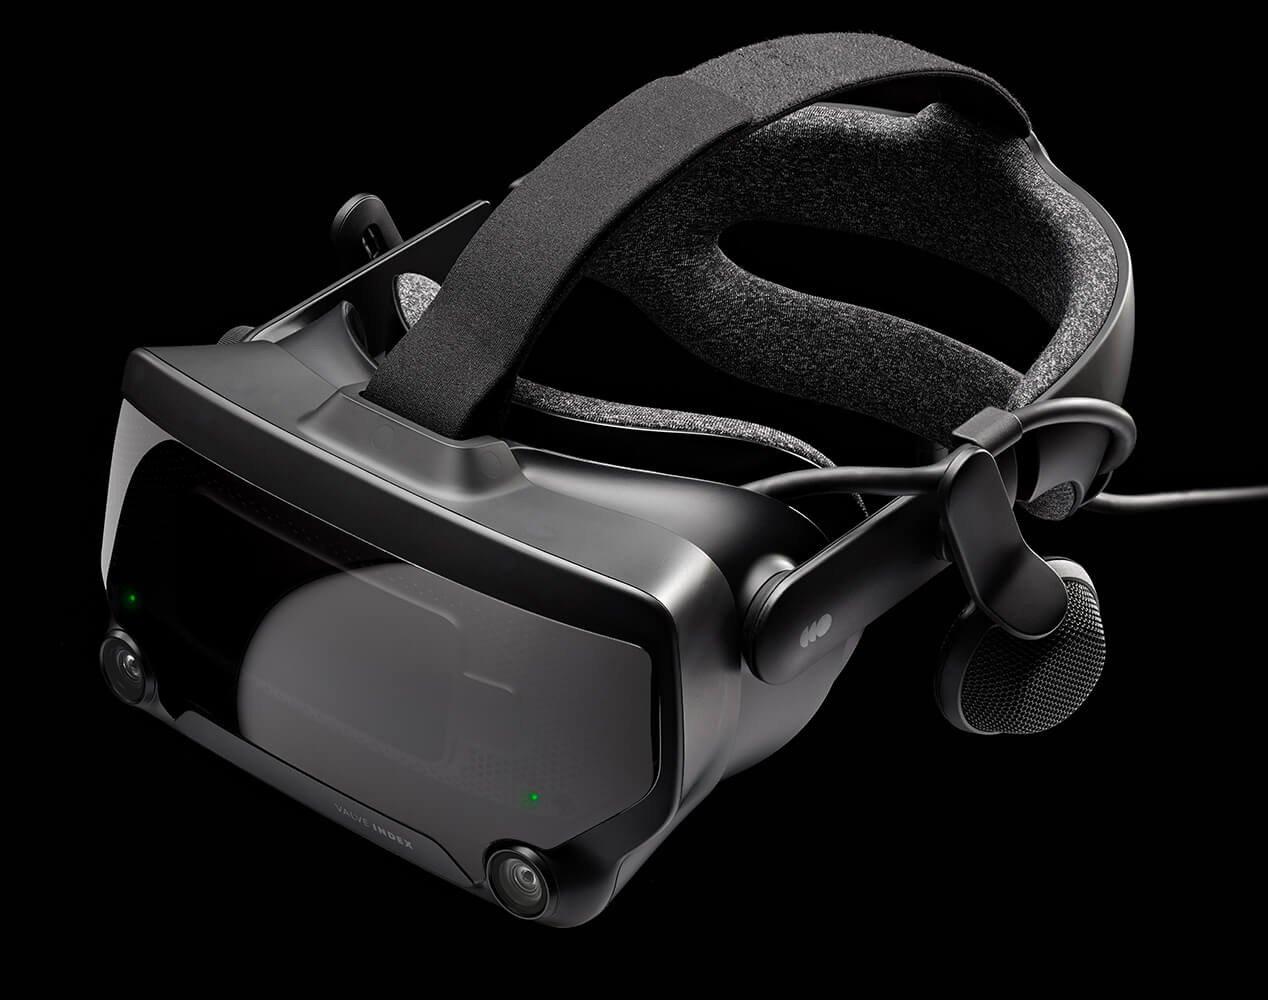 Valve Releases Index VR Headset at werd.com